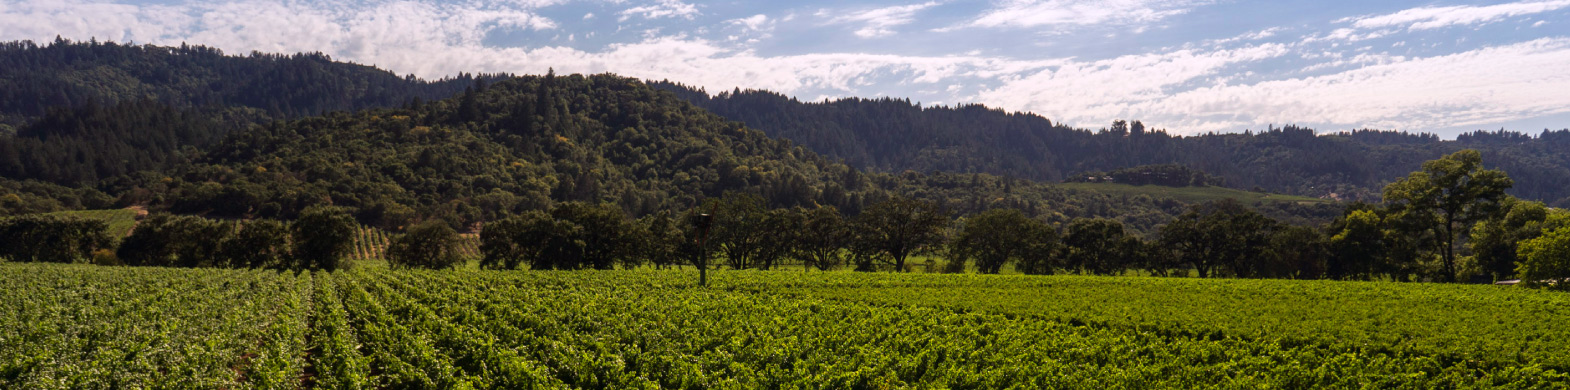 Buy Wine Online: Branding Iron Vineyard